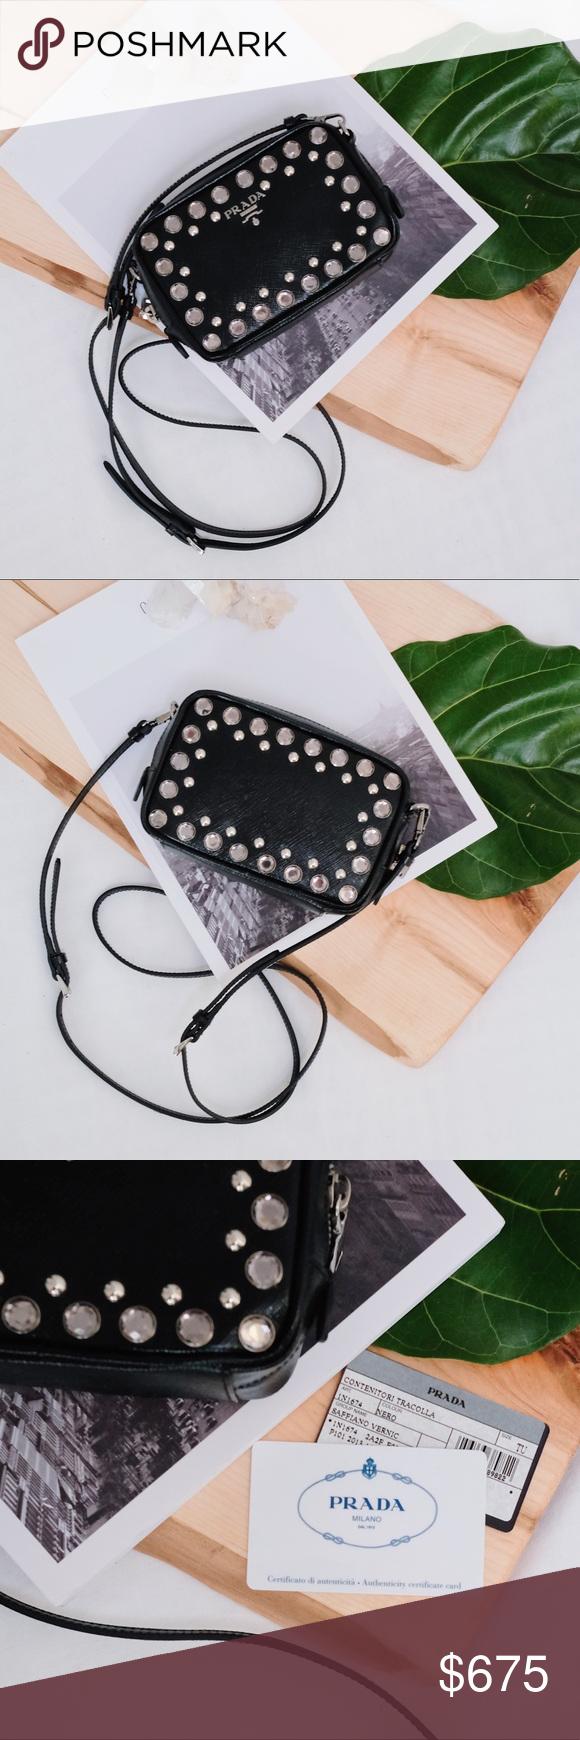 99df86fdf36d5d Prada Saffiano Studded Mini Crossbody—Black Prada Saffiano Studded Mini Zip  Crossbody Bag in Black